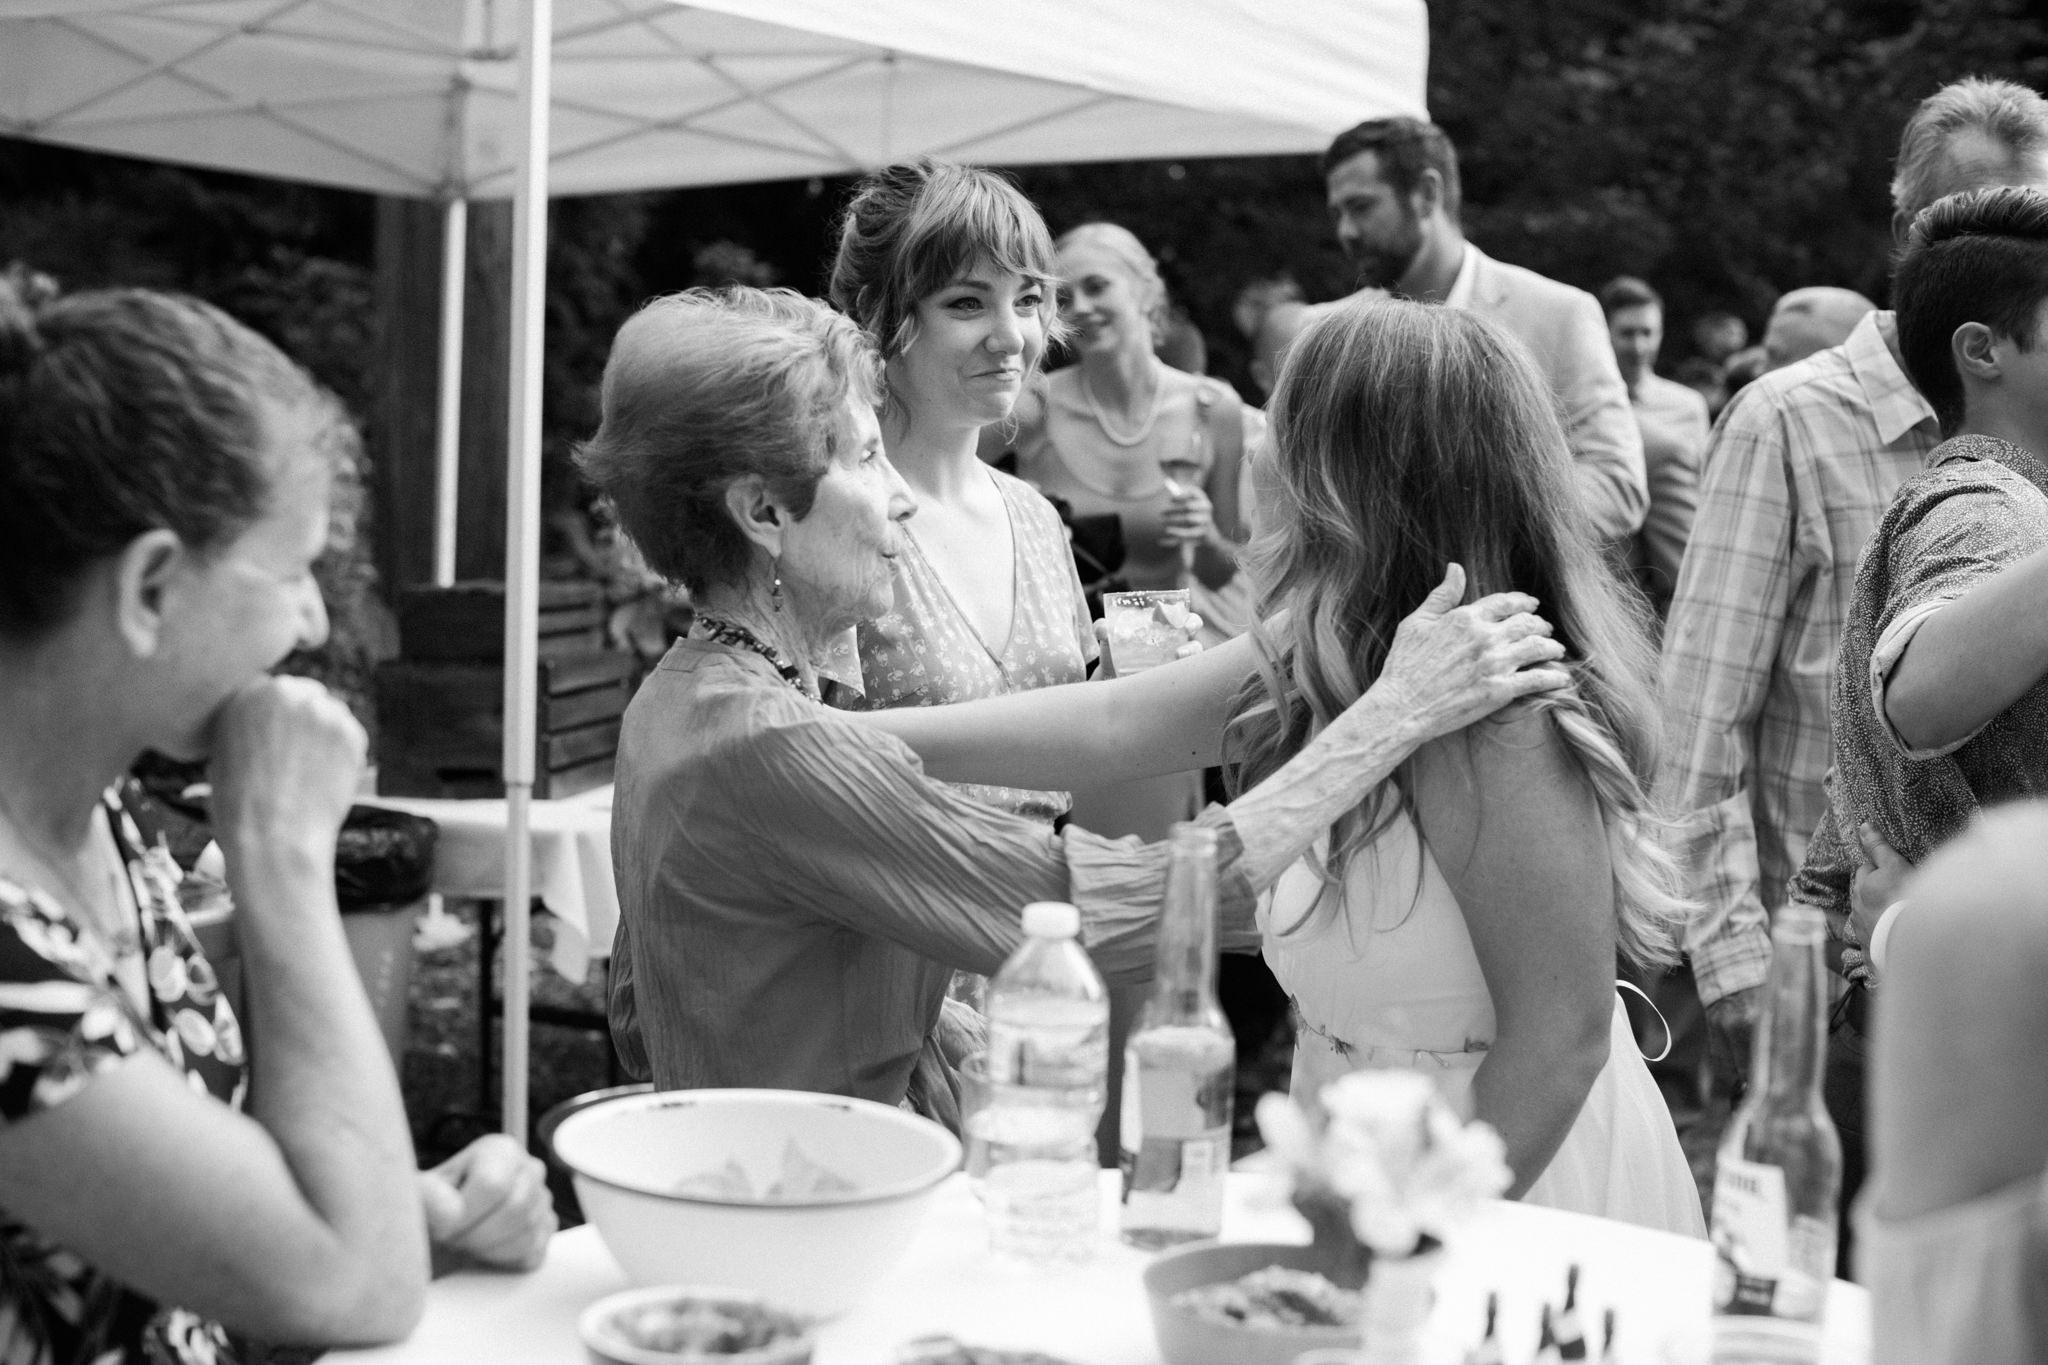 Backyard-Bainbridge-Island-Wedding-Alycia-Lovell-Photography-142.JPG